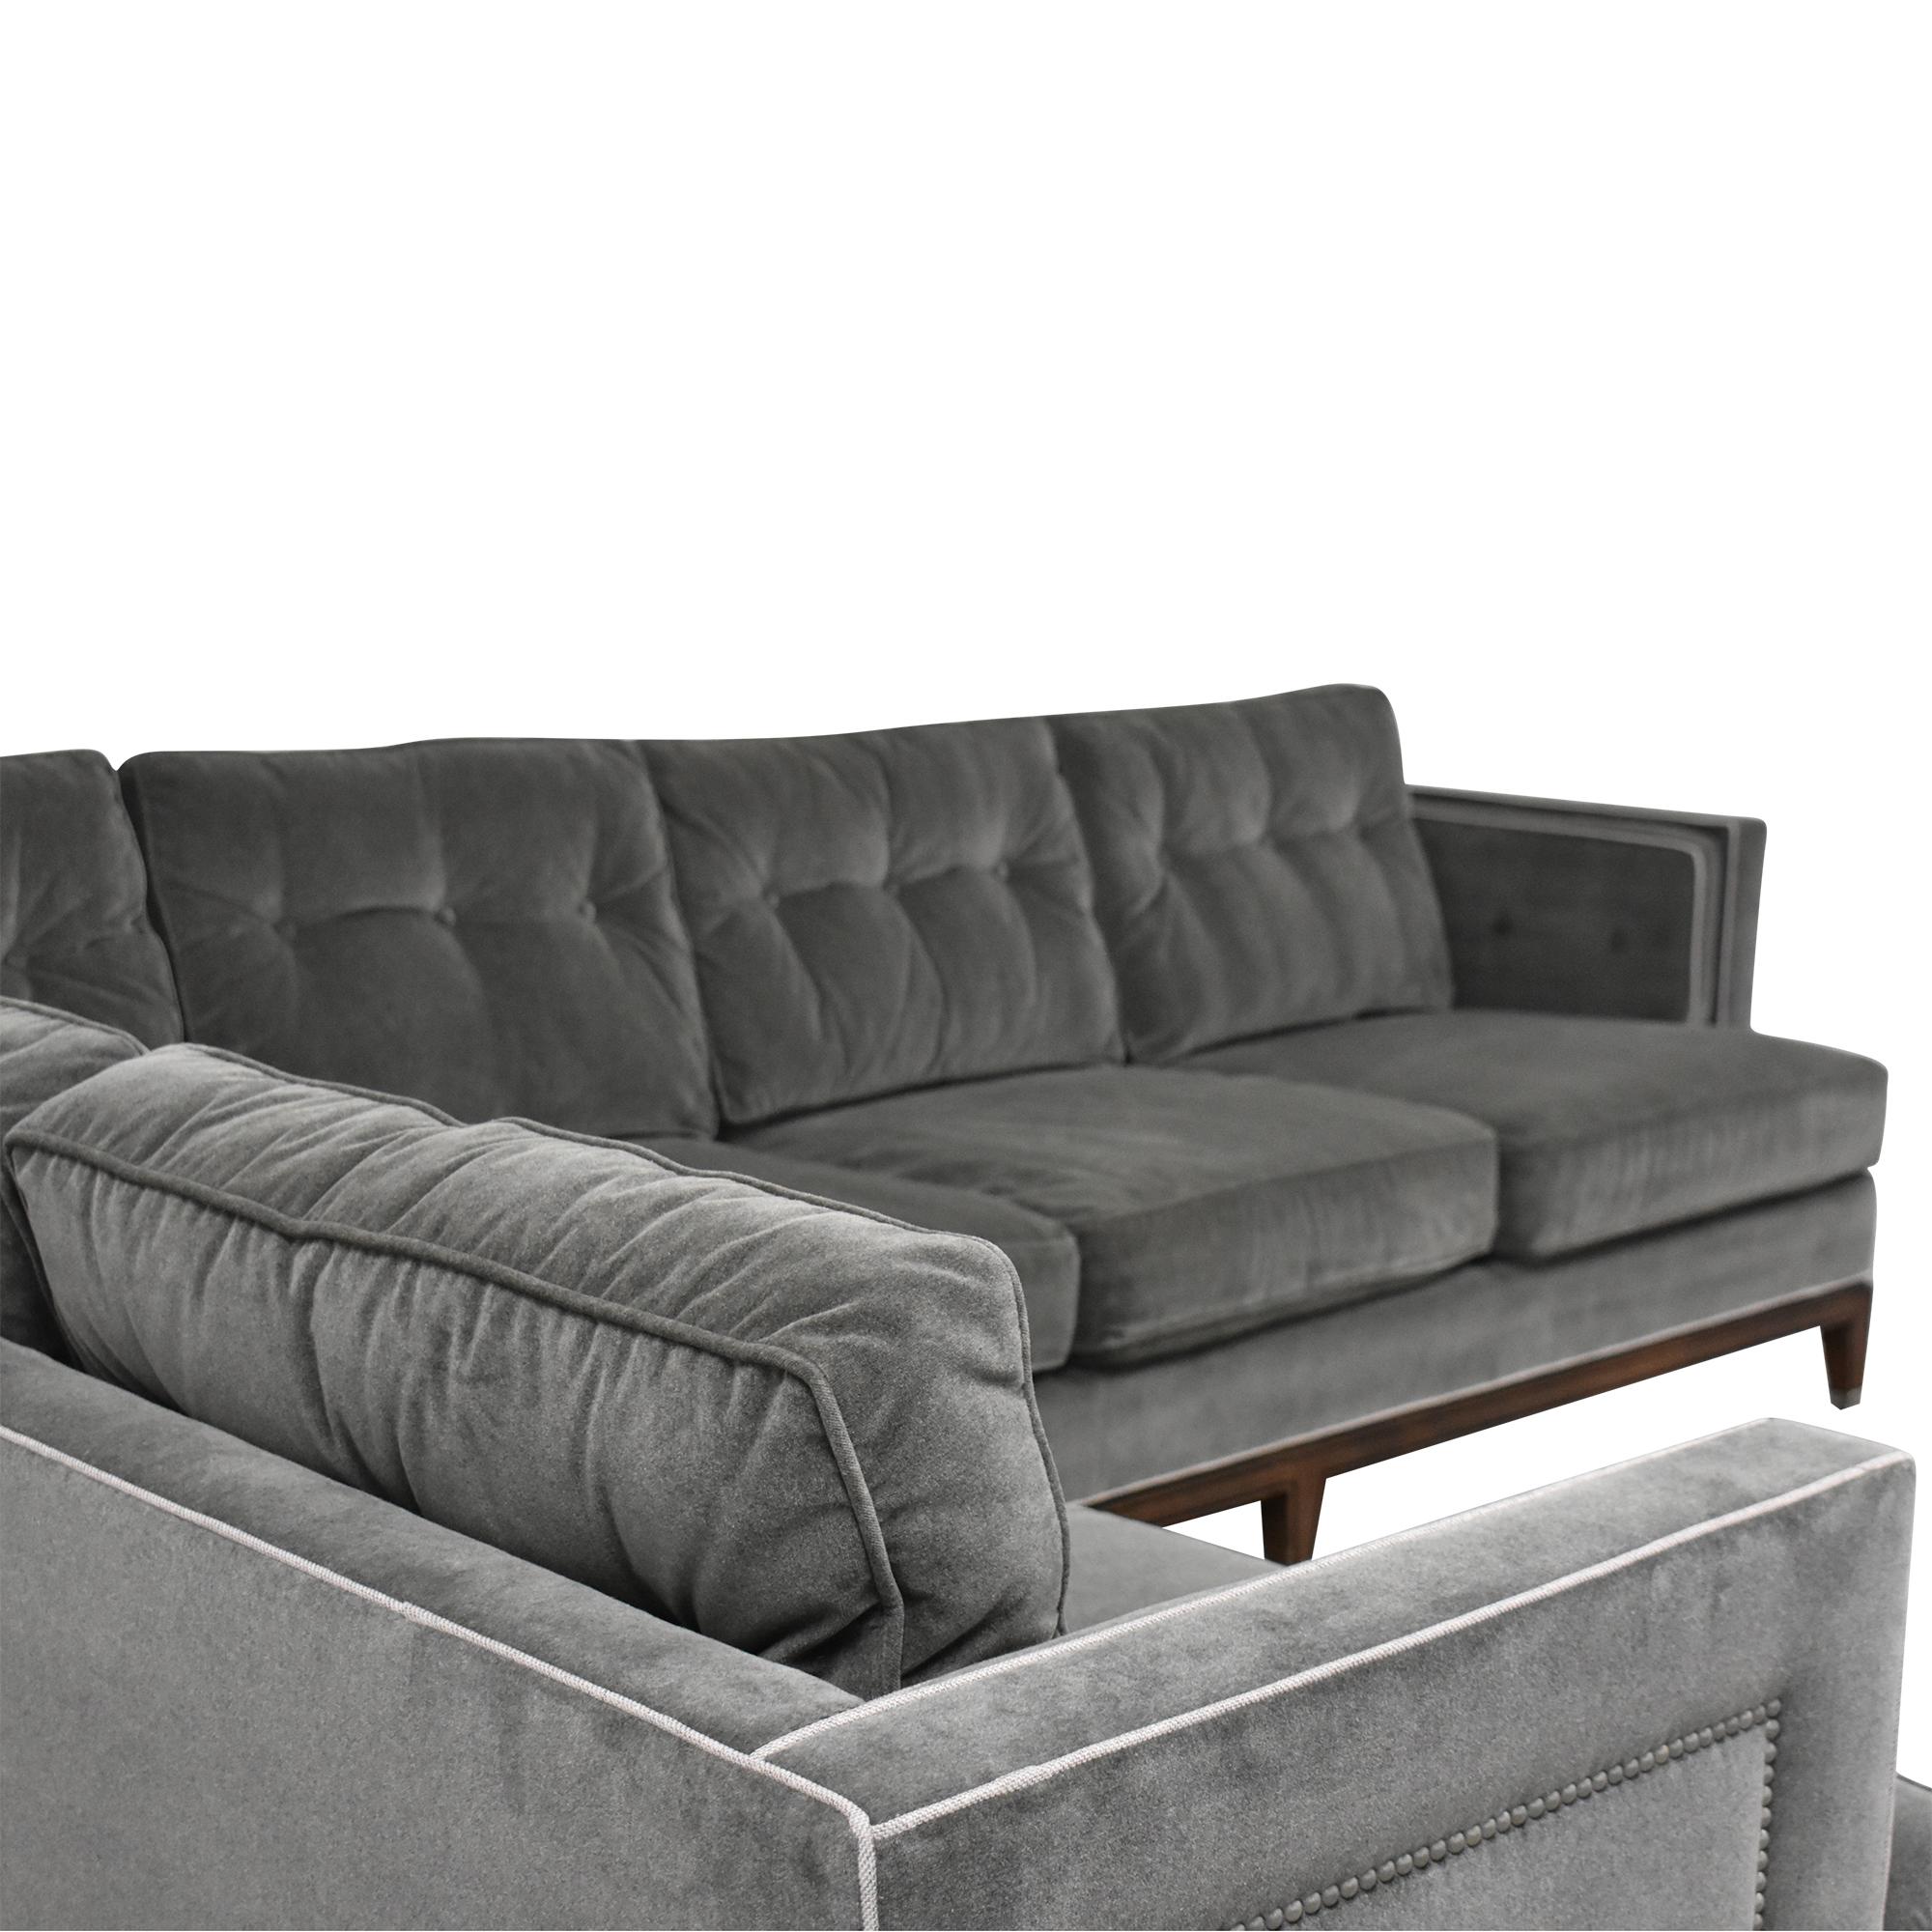 Vanguard Furniture Vanguard  Furniture Whitaker Sectional Sofa pa